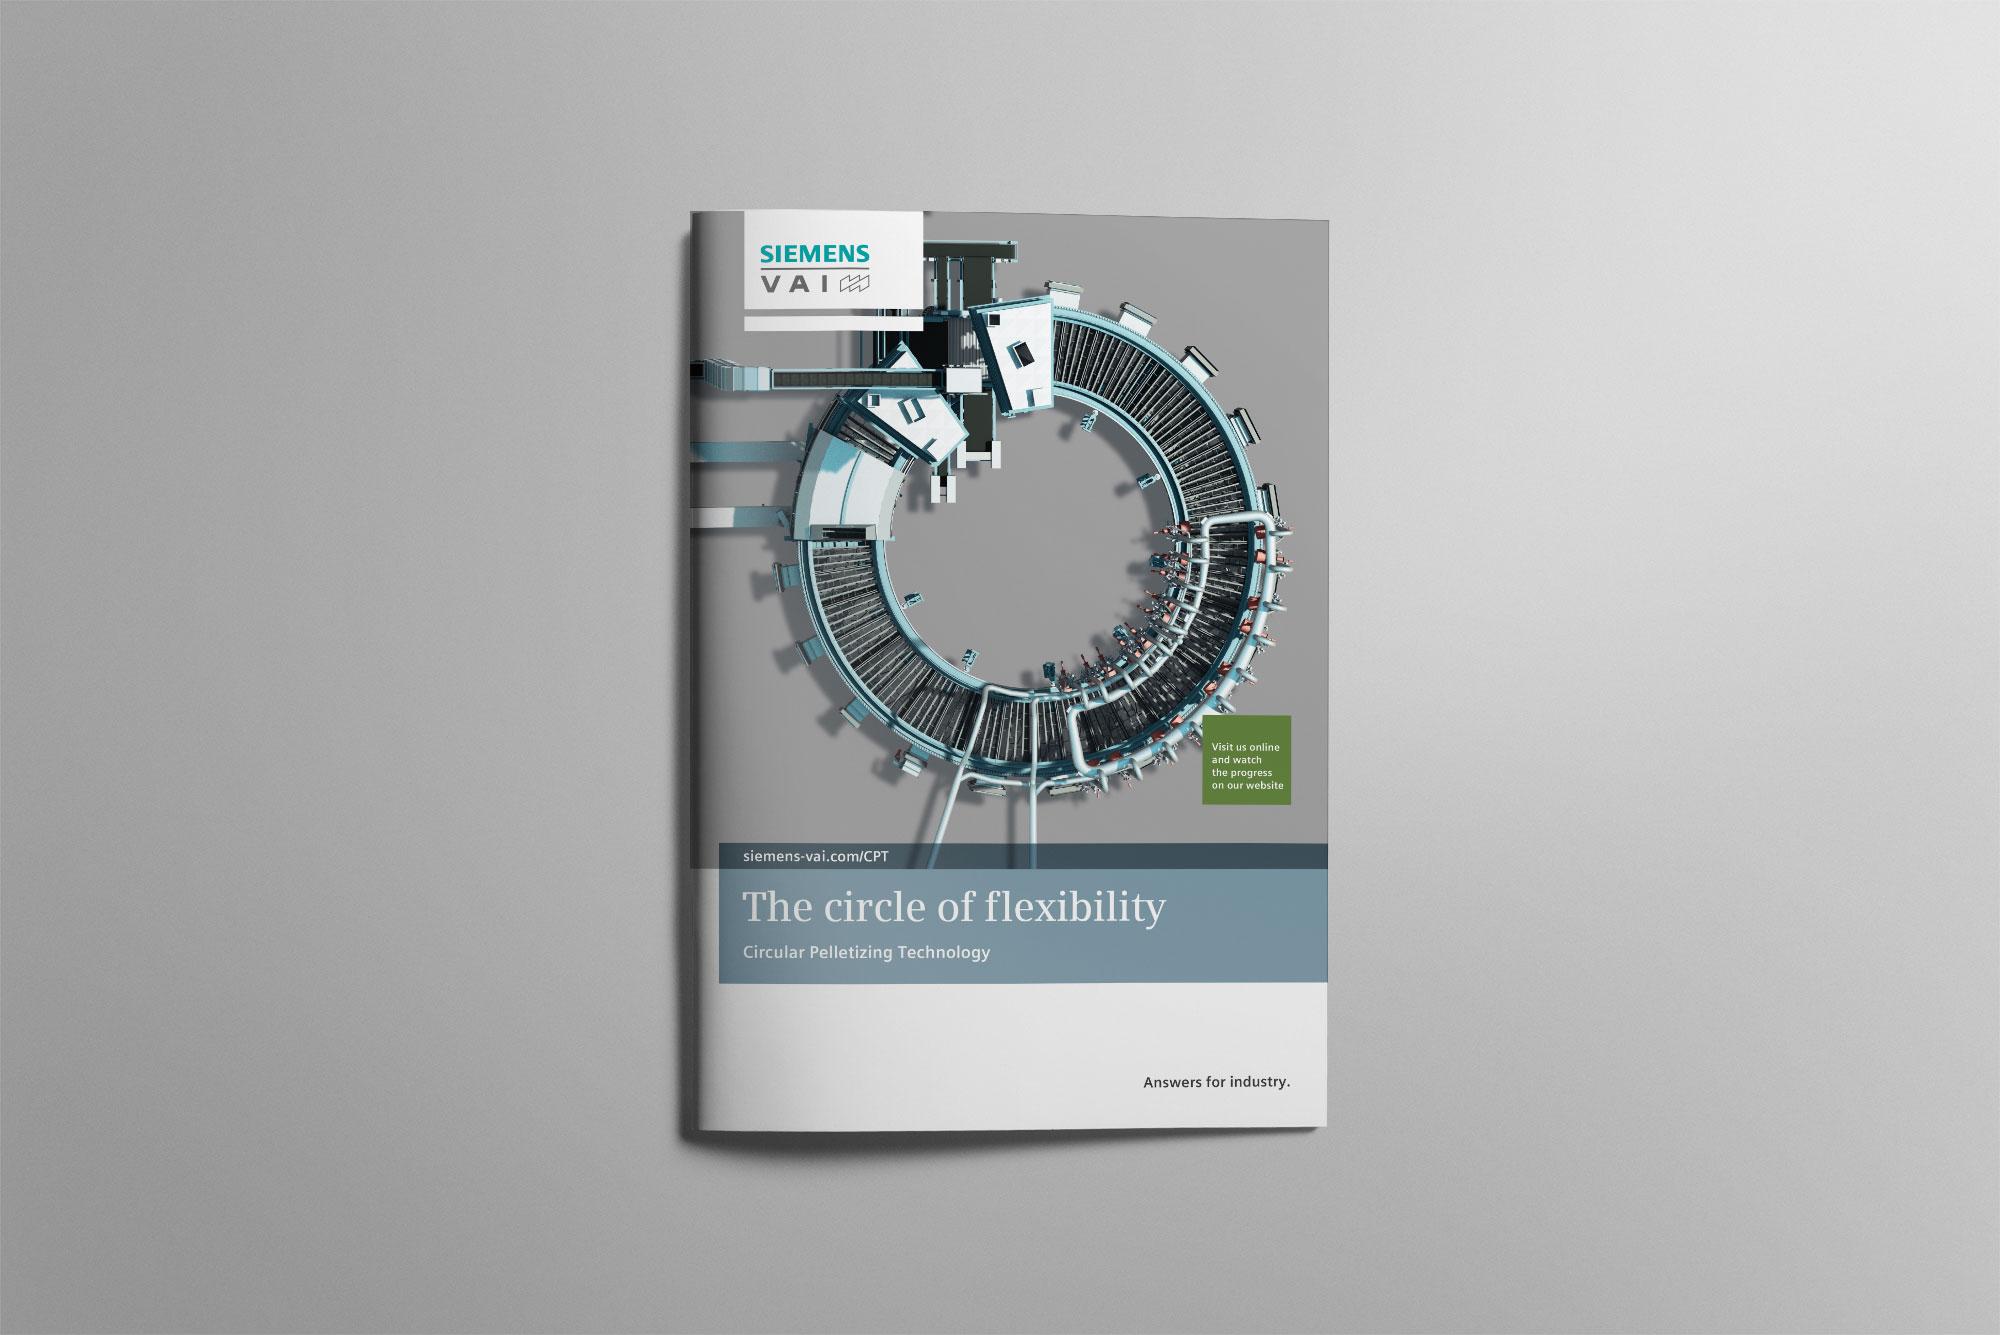 Siemens VAI brochure cover